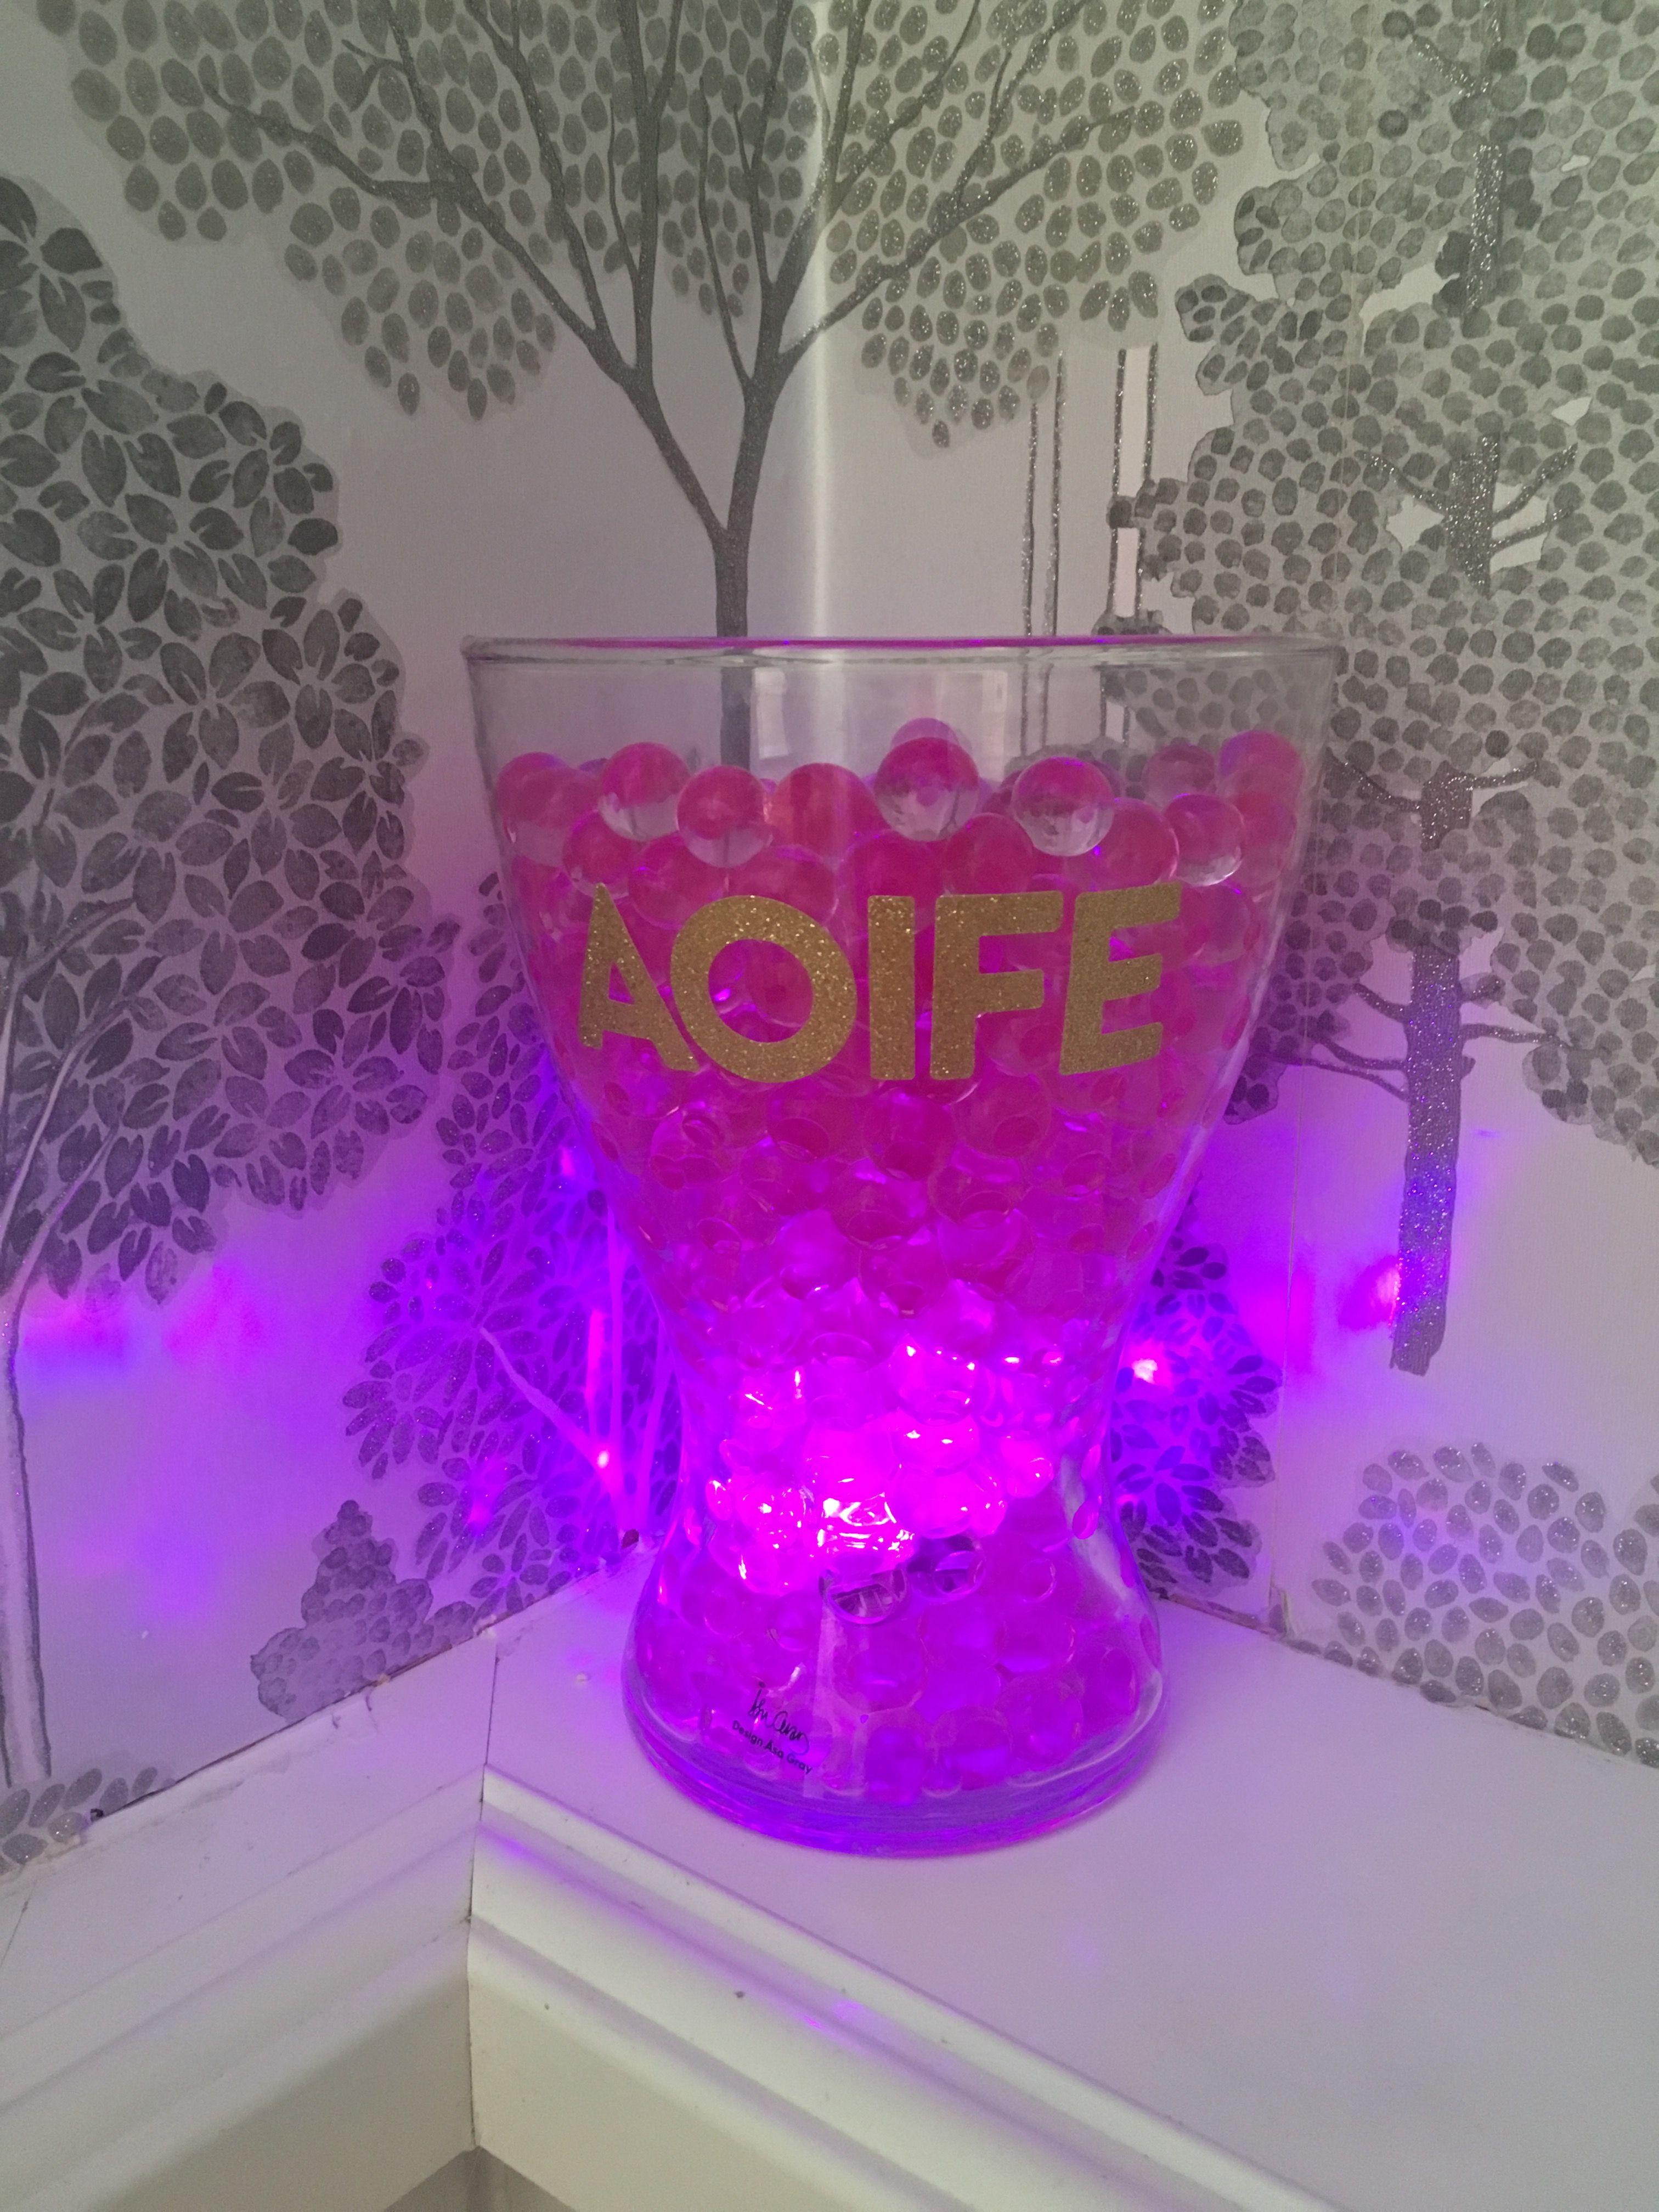 Pin by R.Maisie on Birthday decor Ikea vases, Novelty